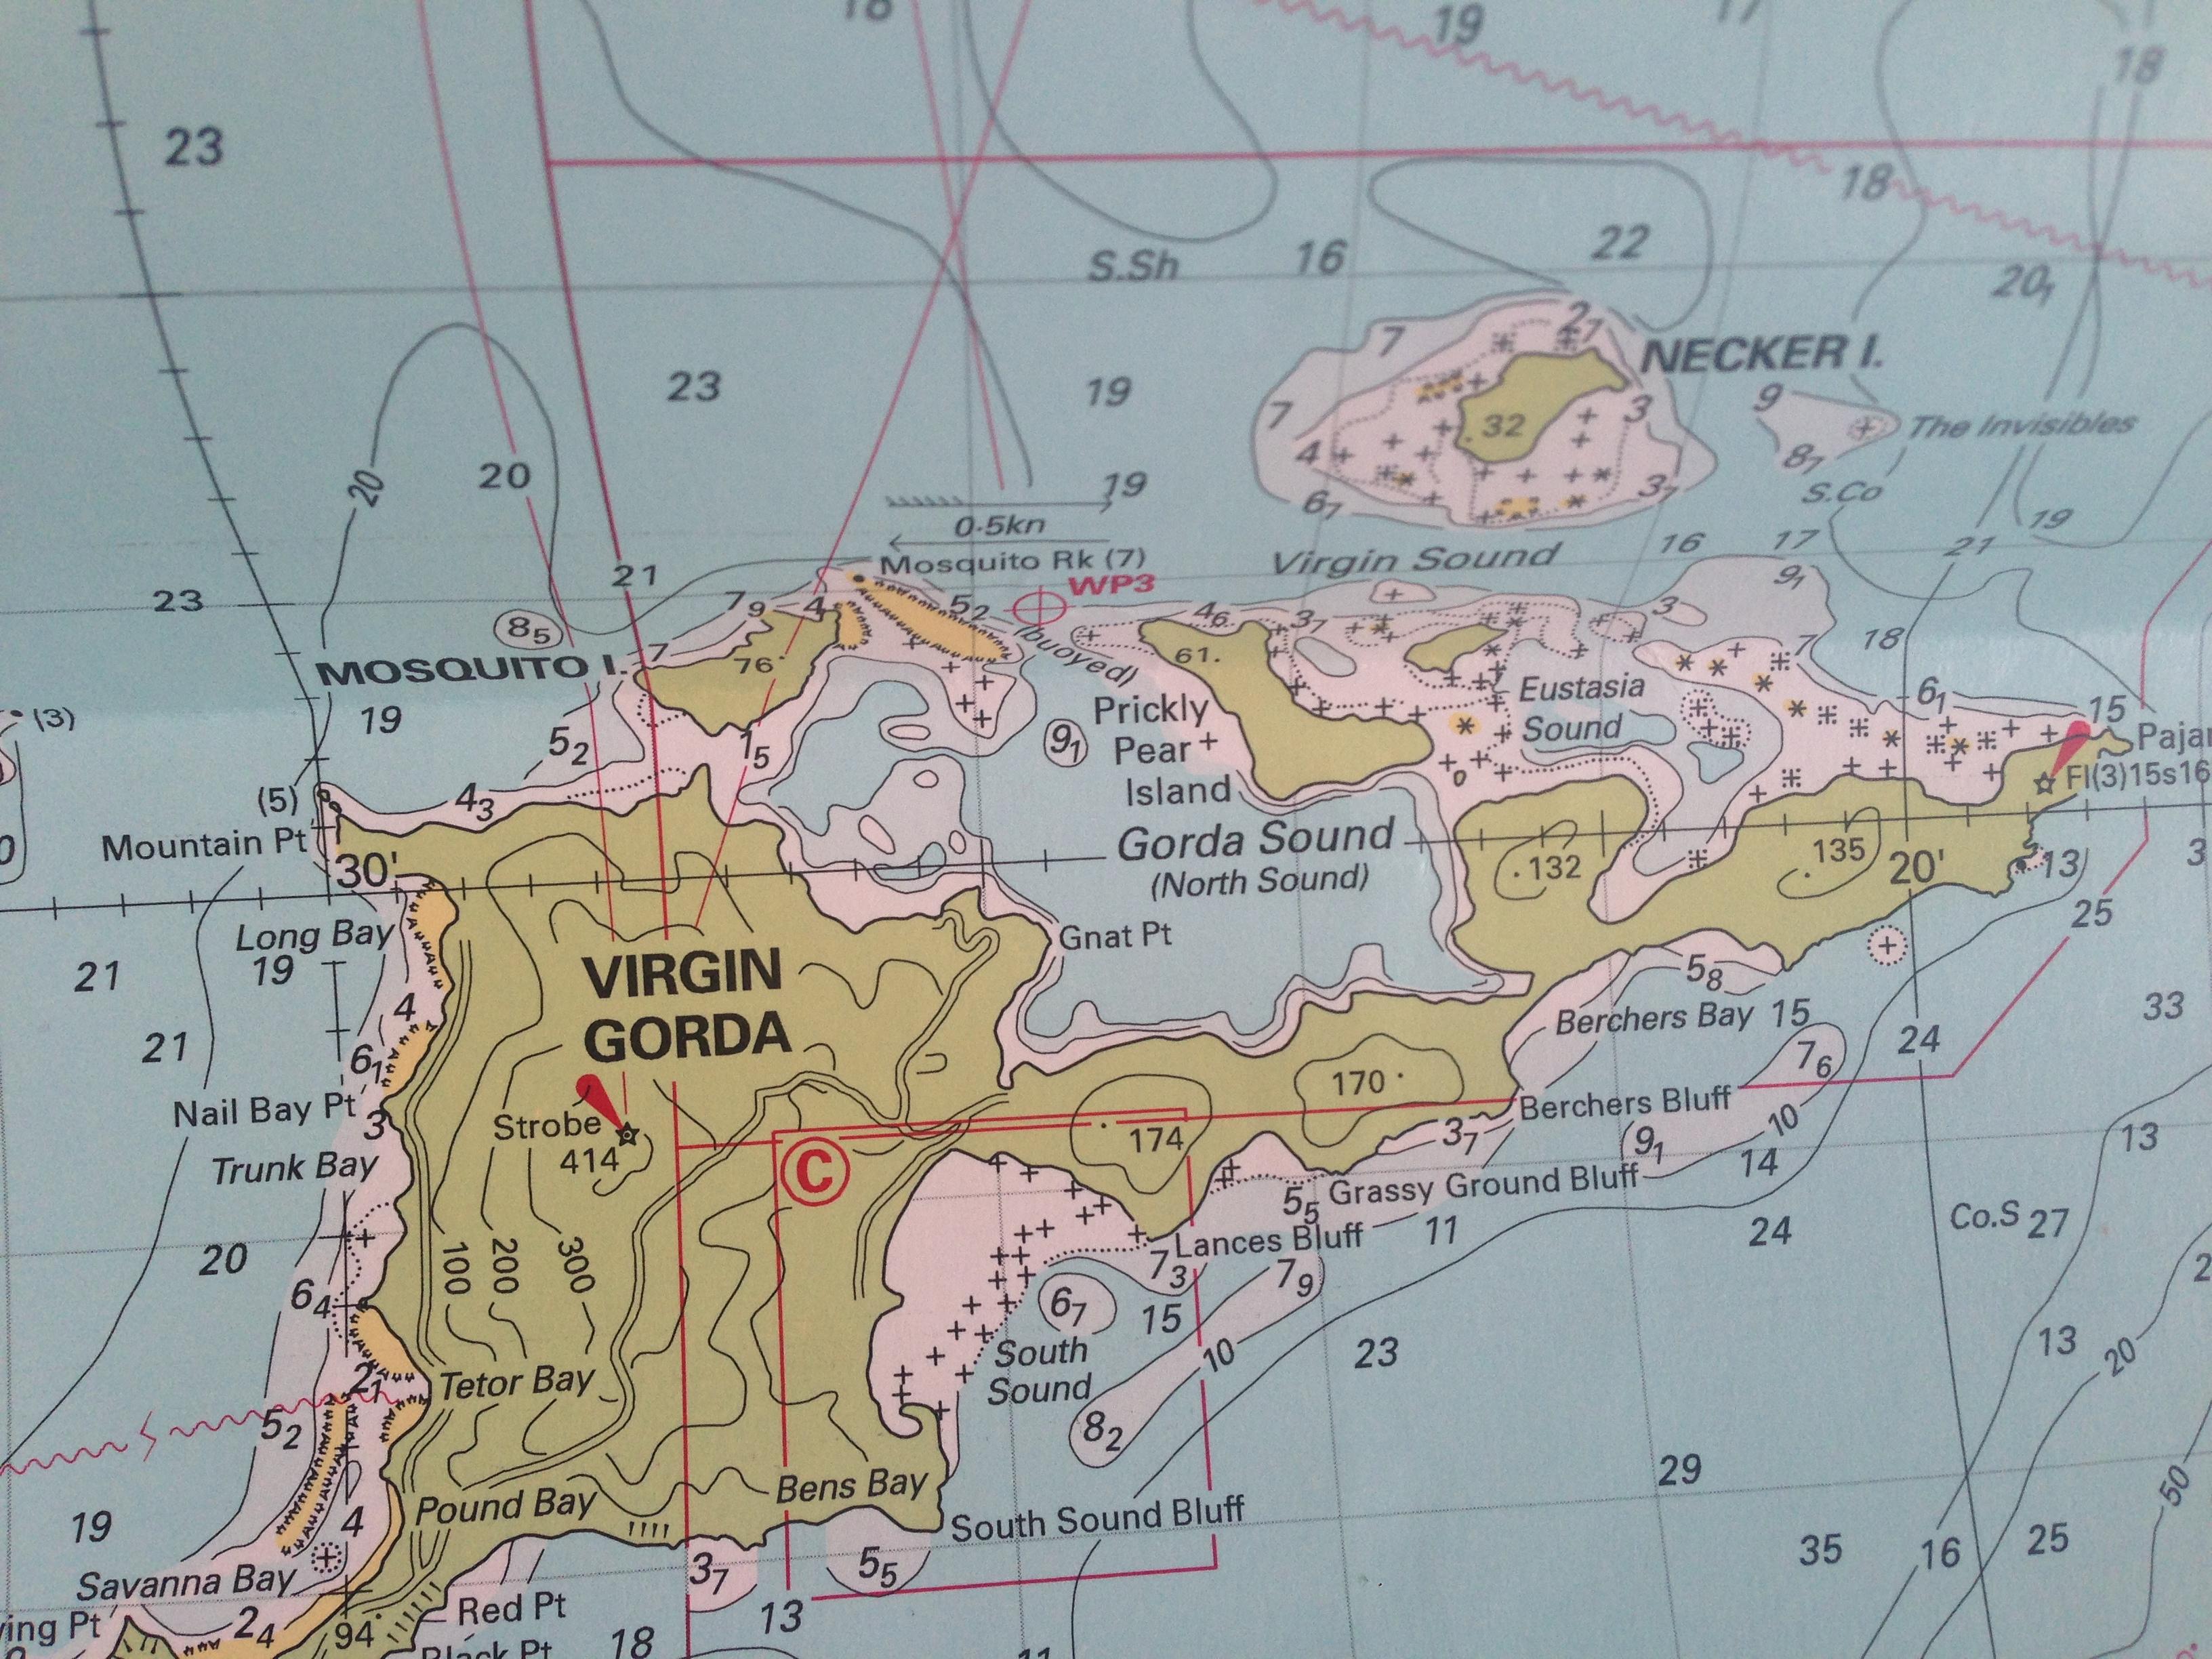 Sail to Biz Growth and see Virgin Gorda Island